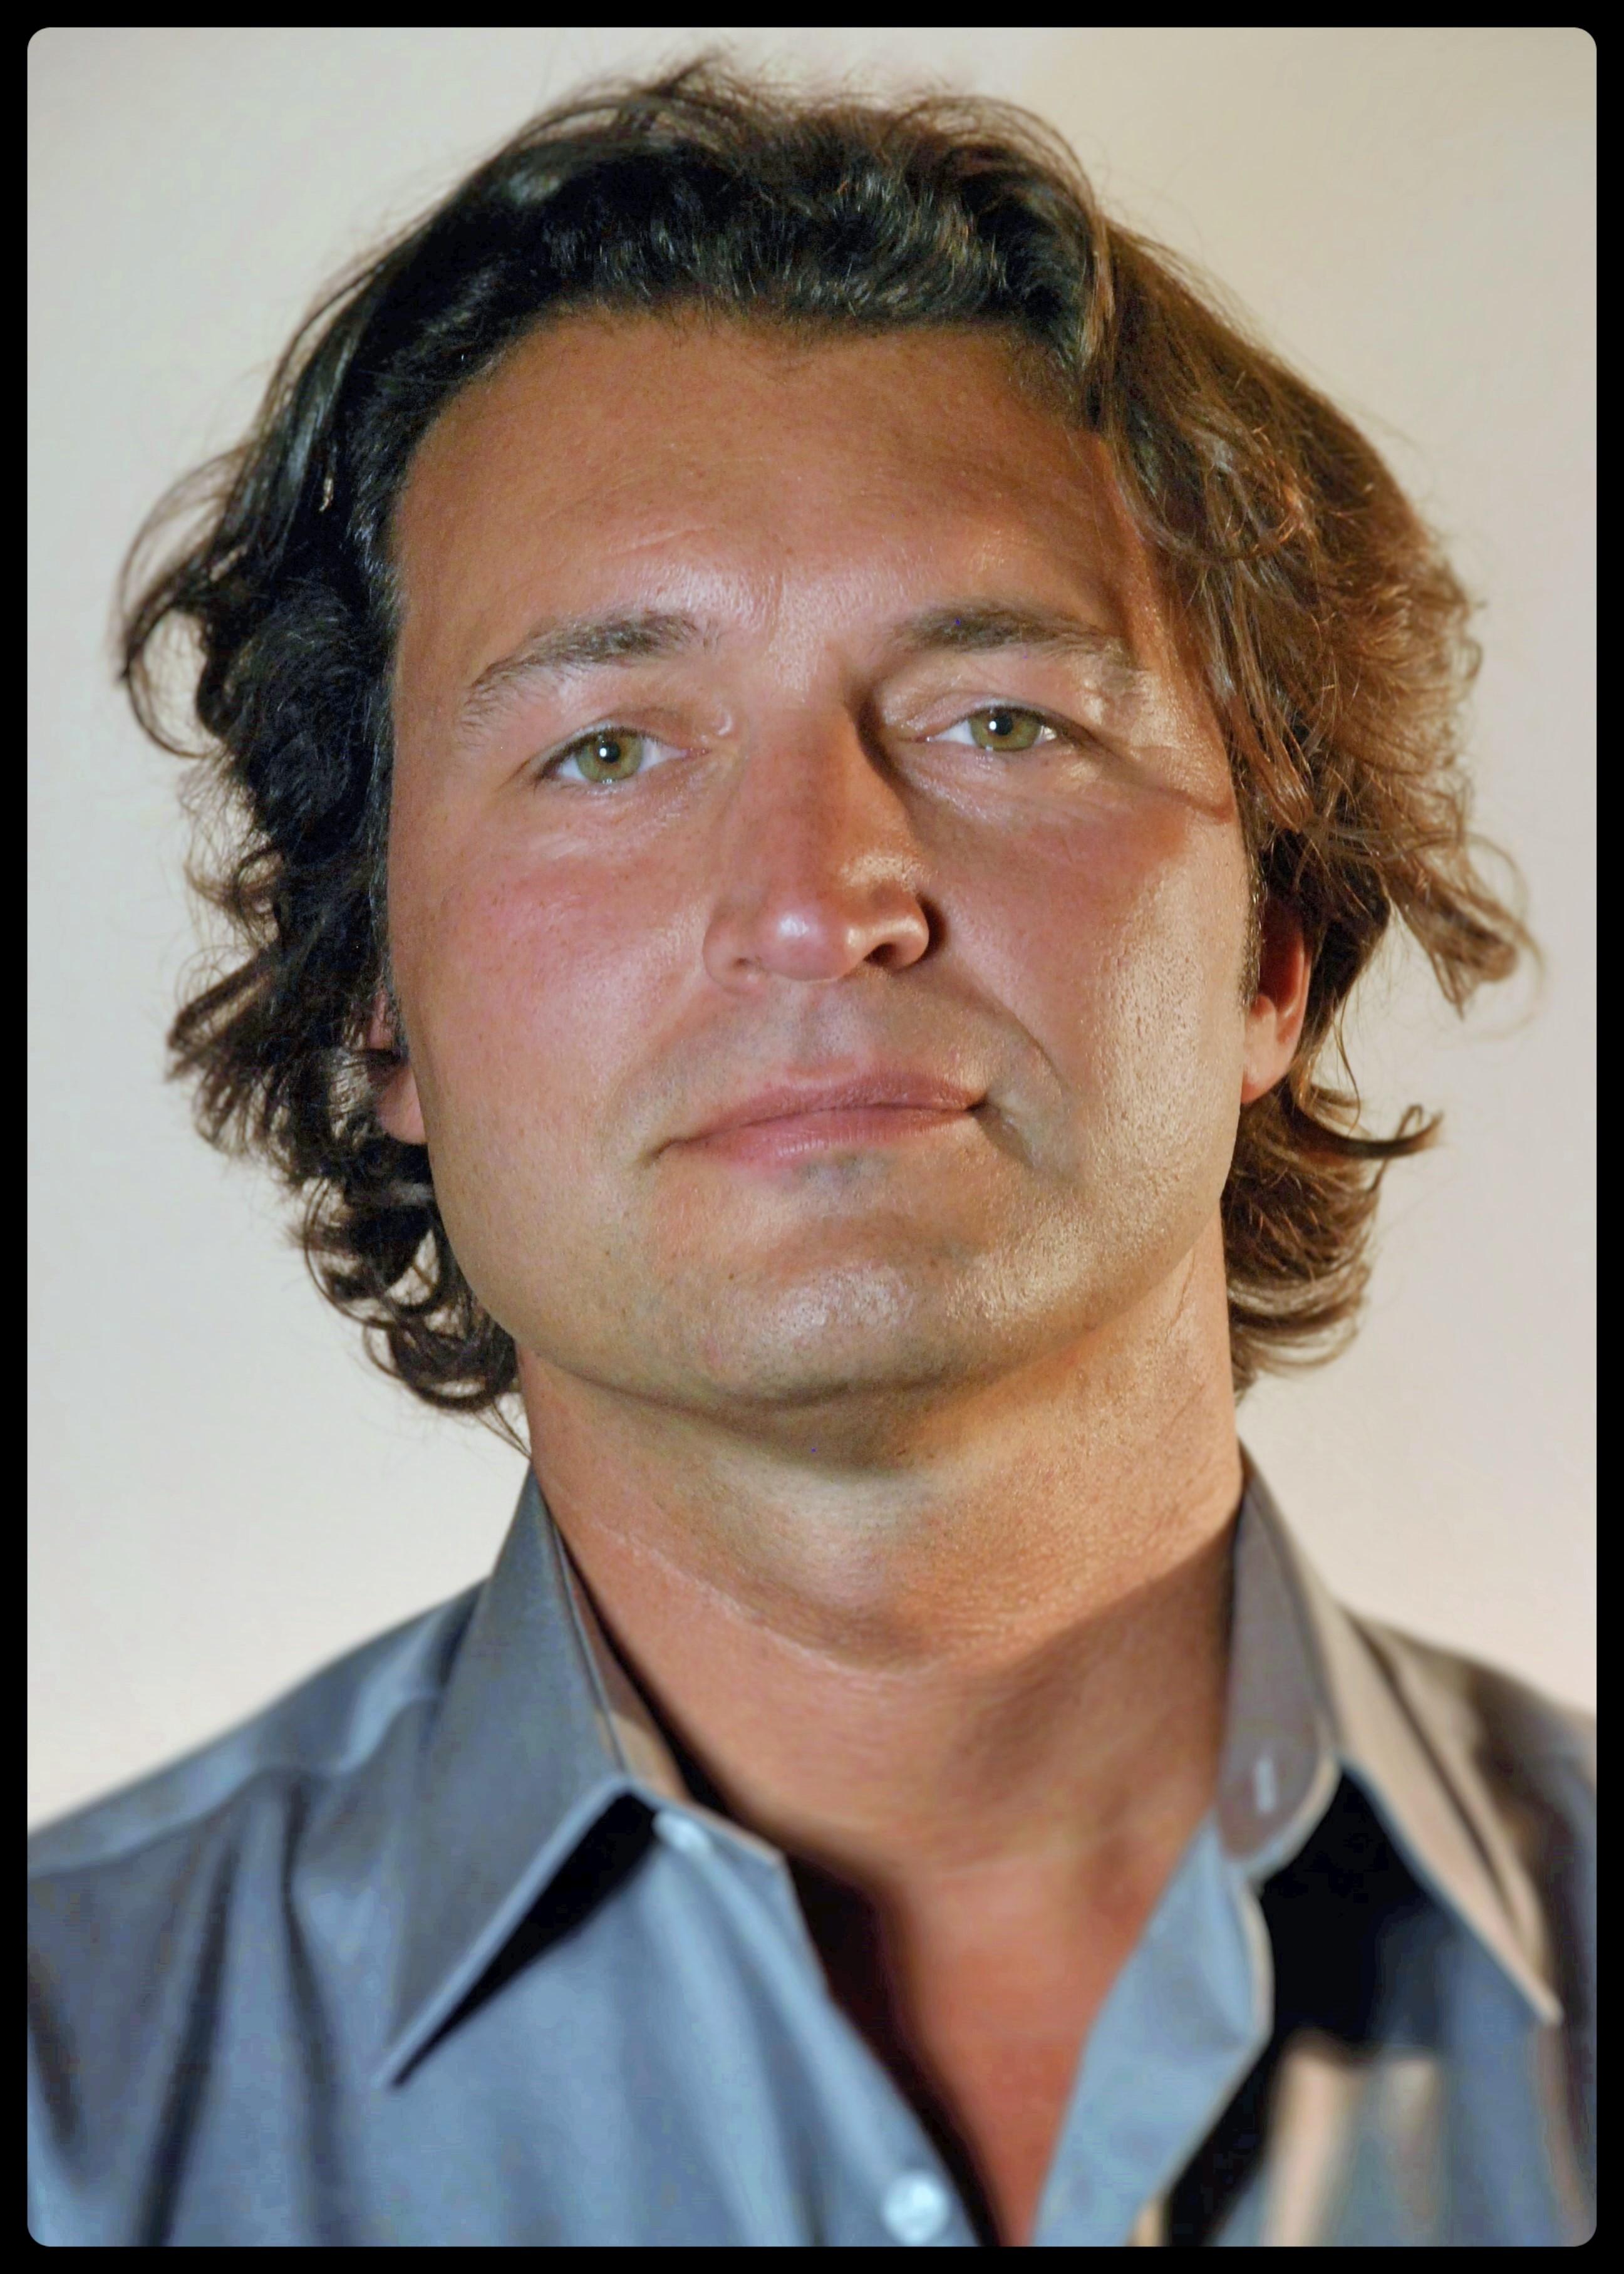 Karl Farrer professional headshot. Long hair